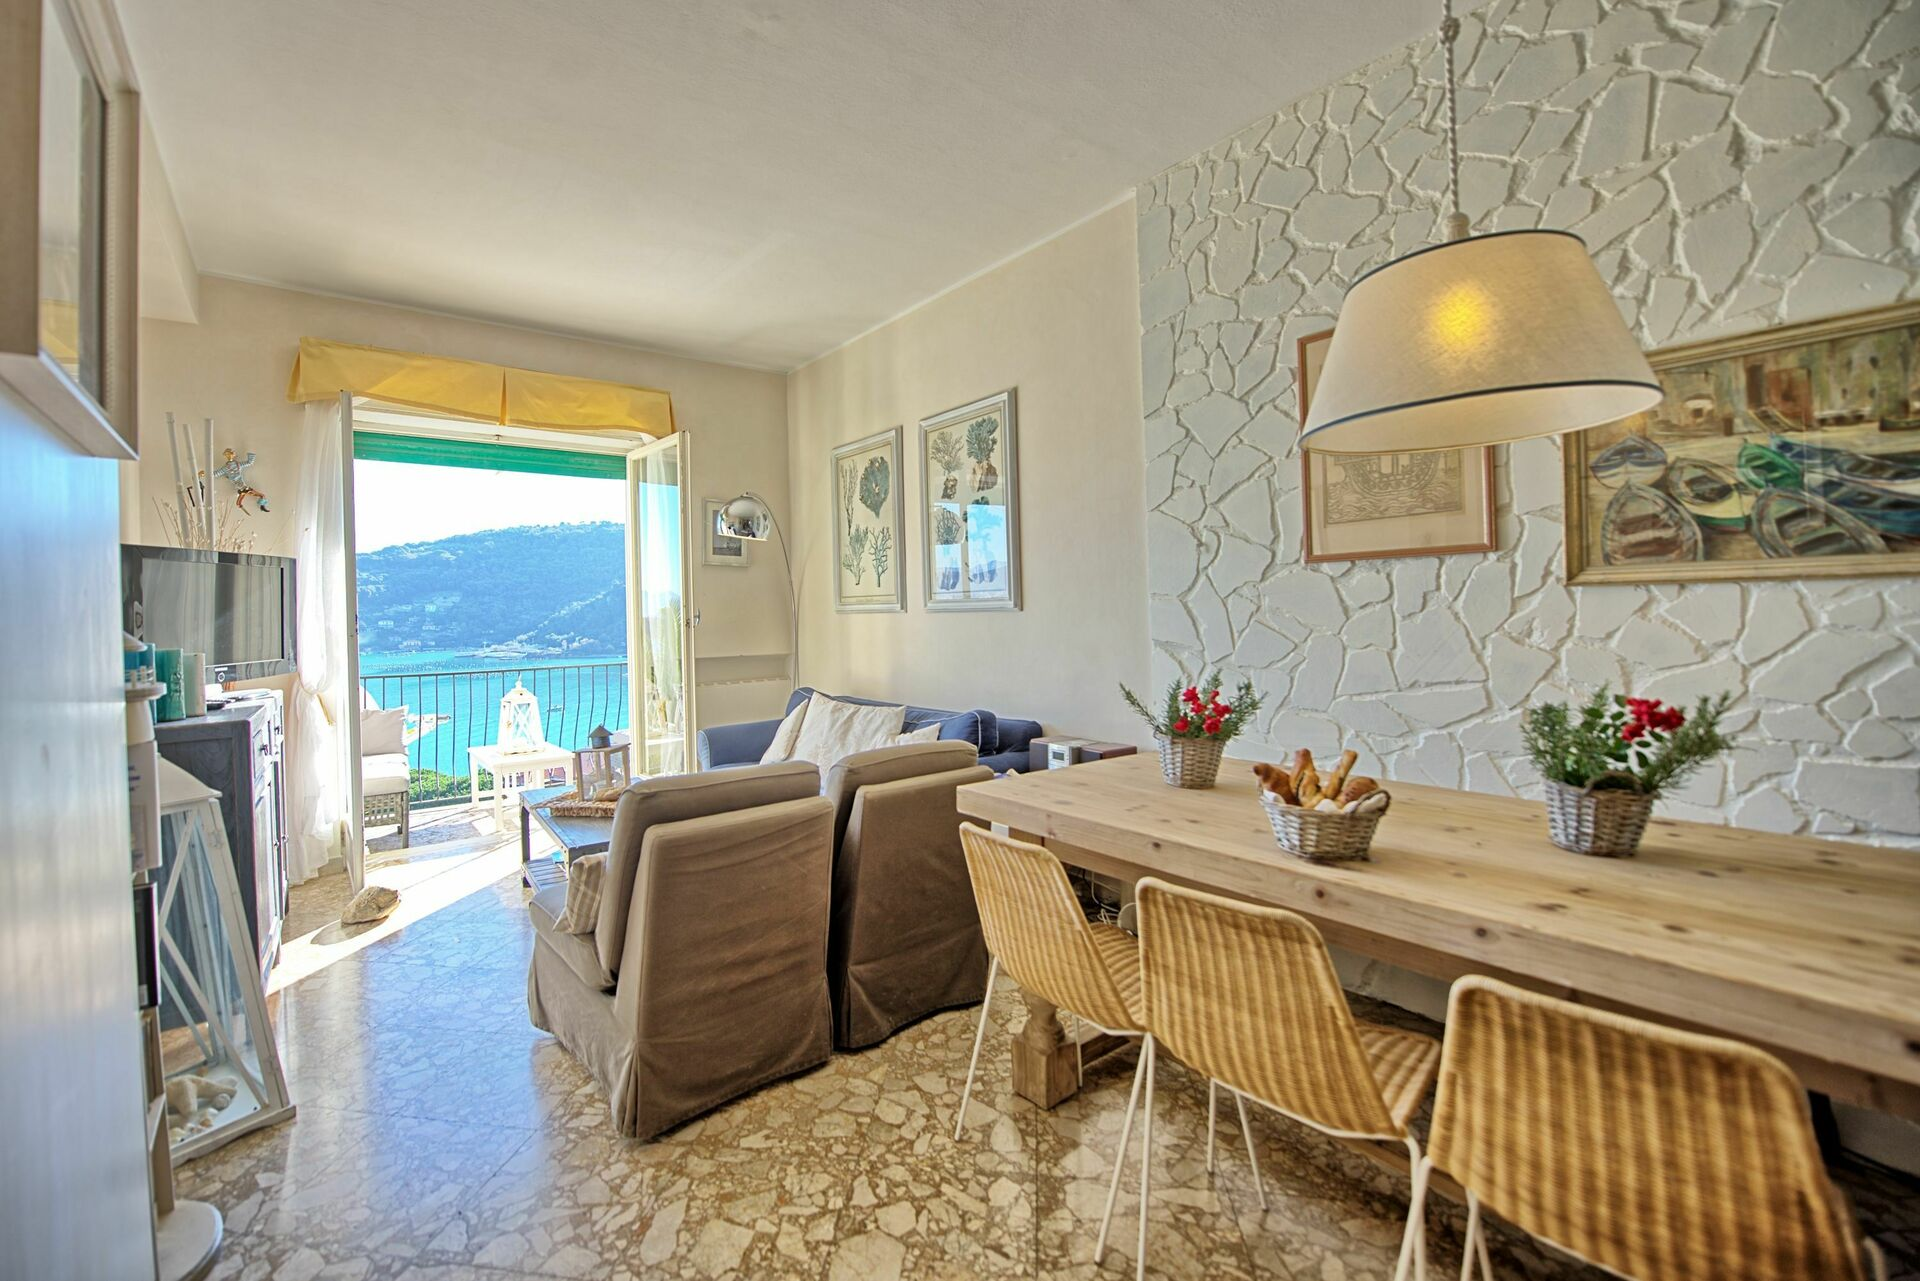 Casa bella apartment vacation rental in portovenere for Casa bella